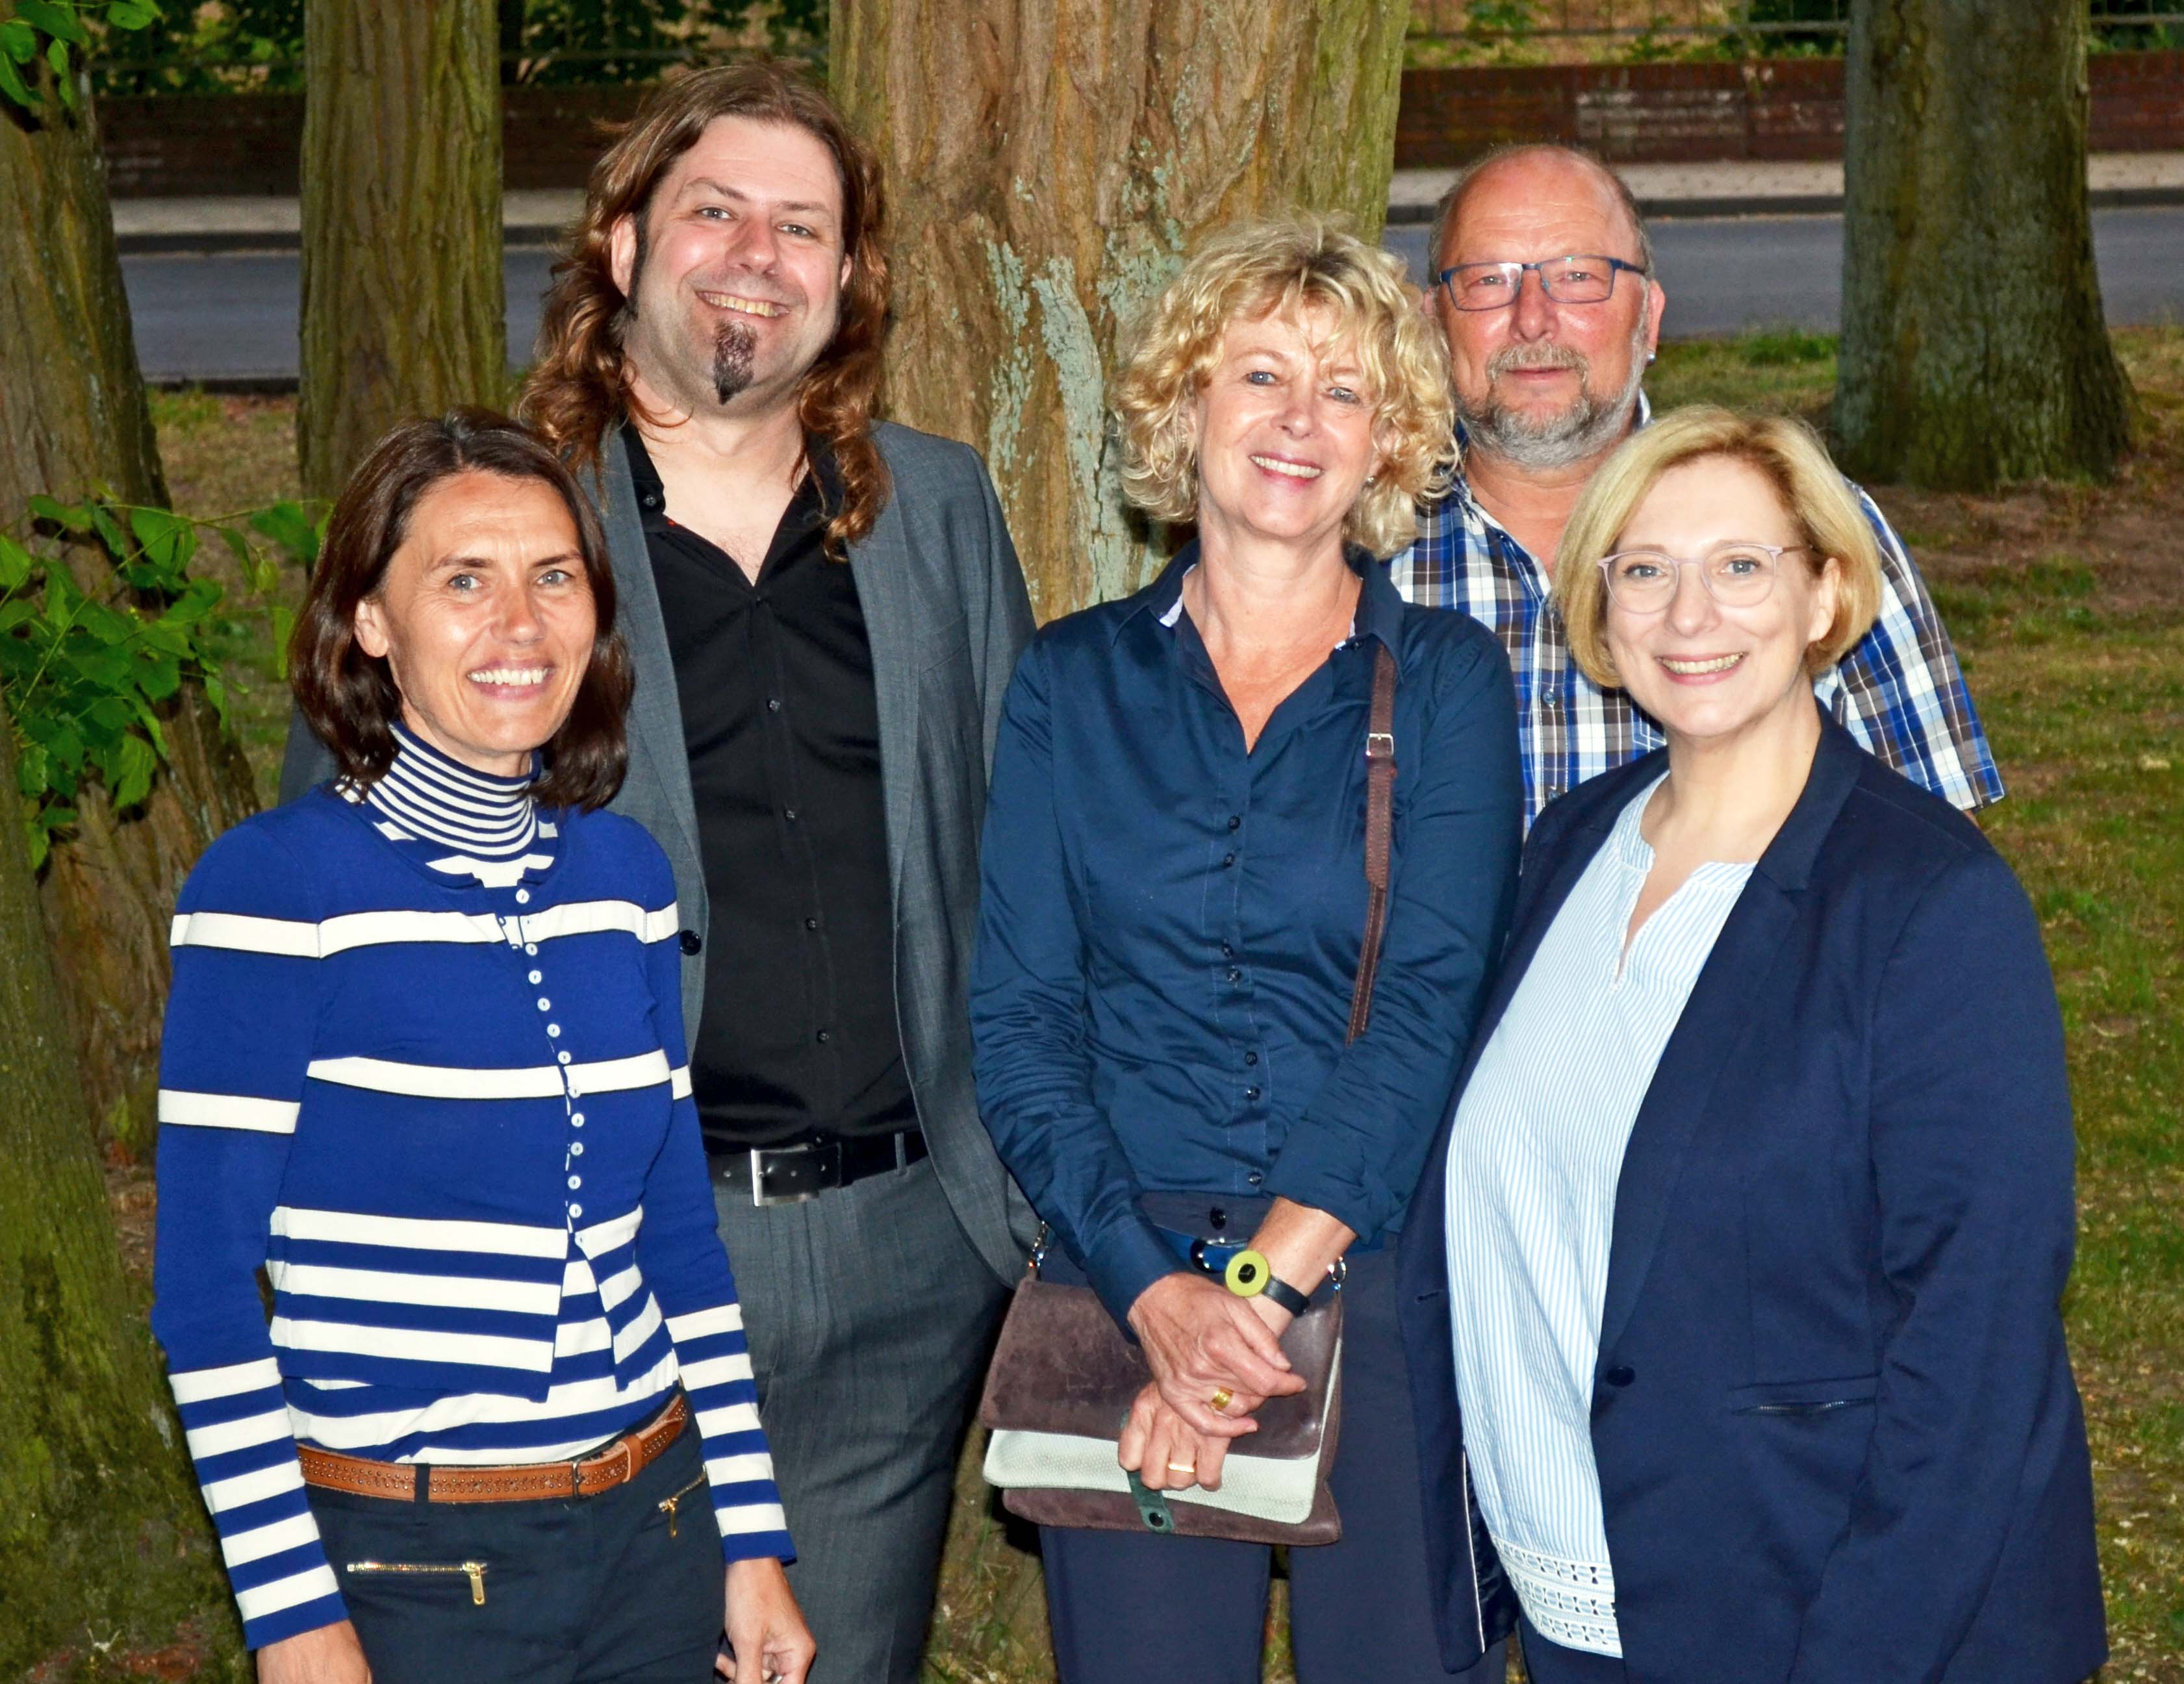 Andrea Kötter, Johan Godschalk, Erna aan de Stegge, Johannes Hessel und Dr. Daniela De Ridder